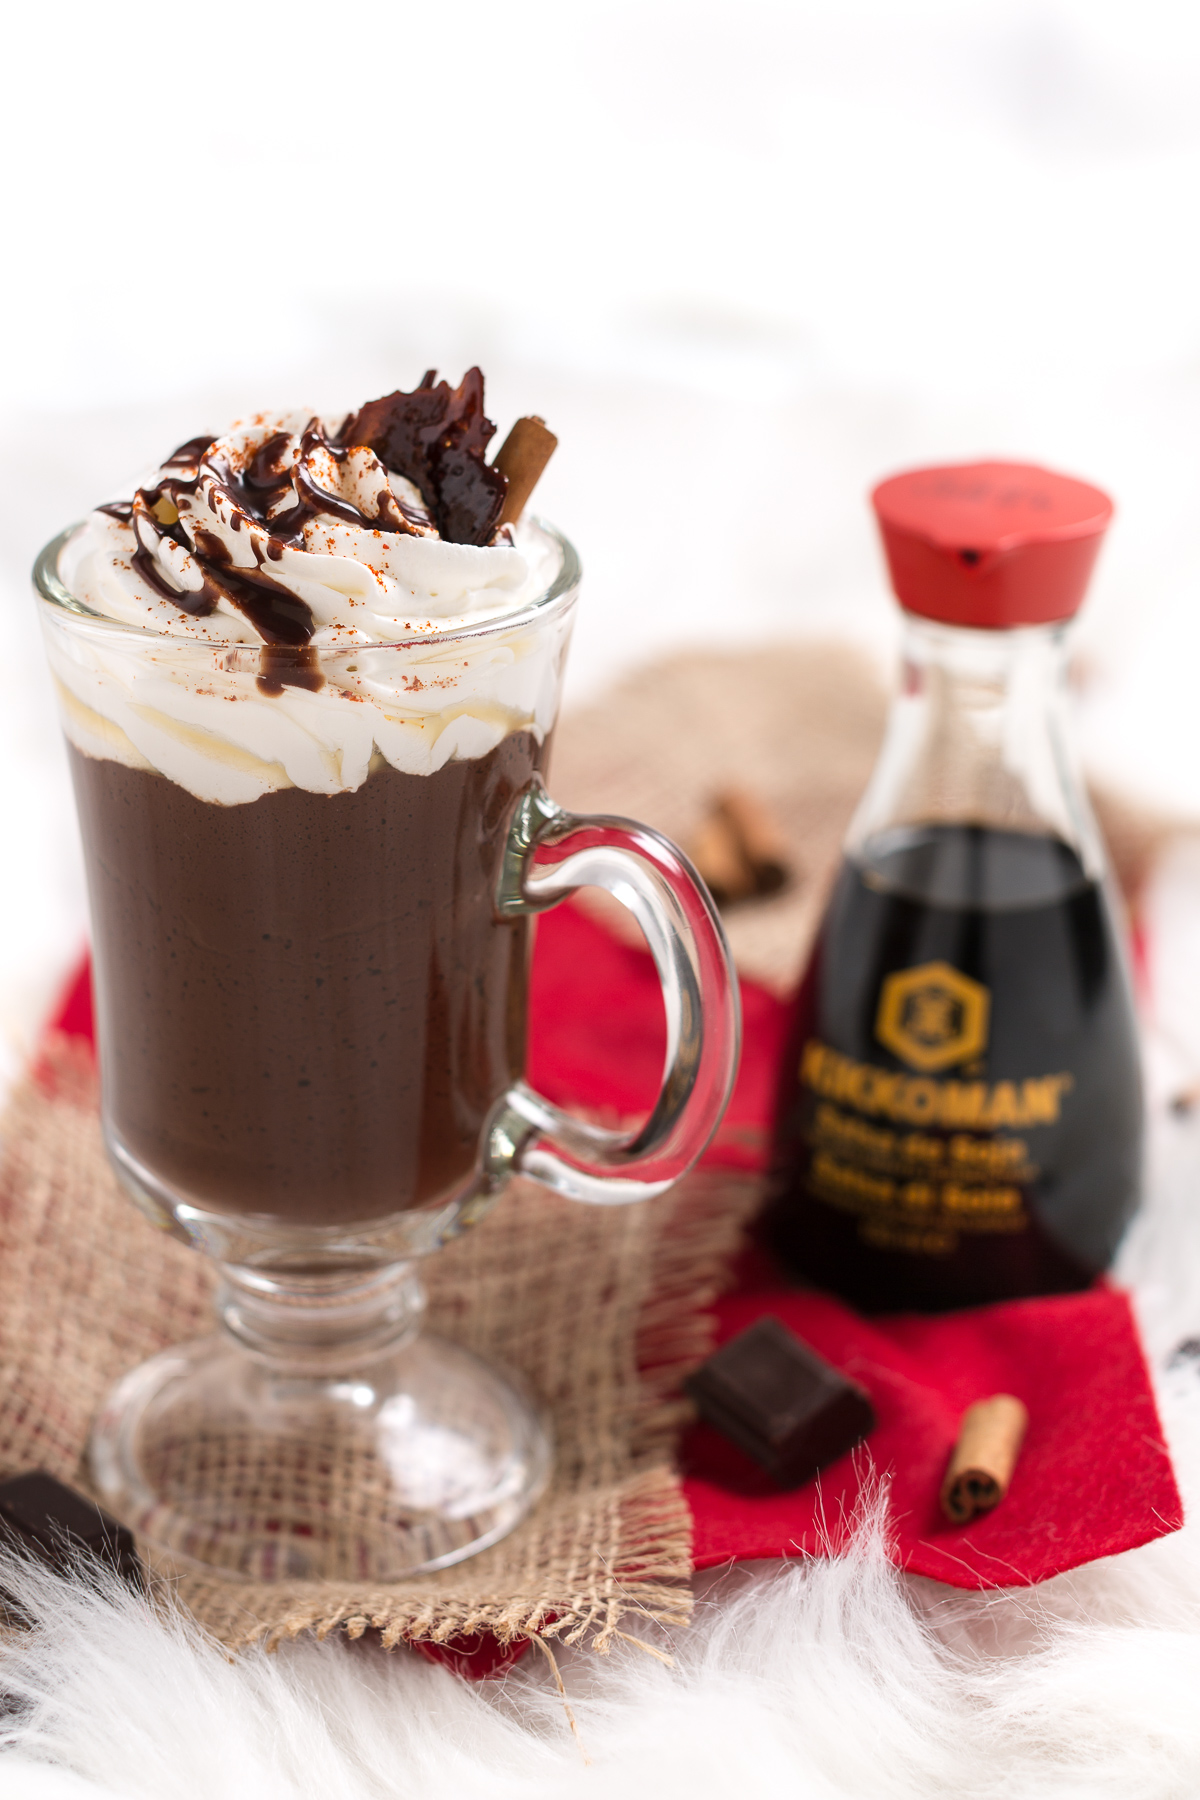 cioccolata calda con caramello croccante salato e sciroppo al cioccolato - salted vegan hot chocolate